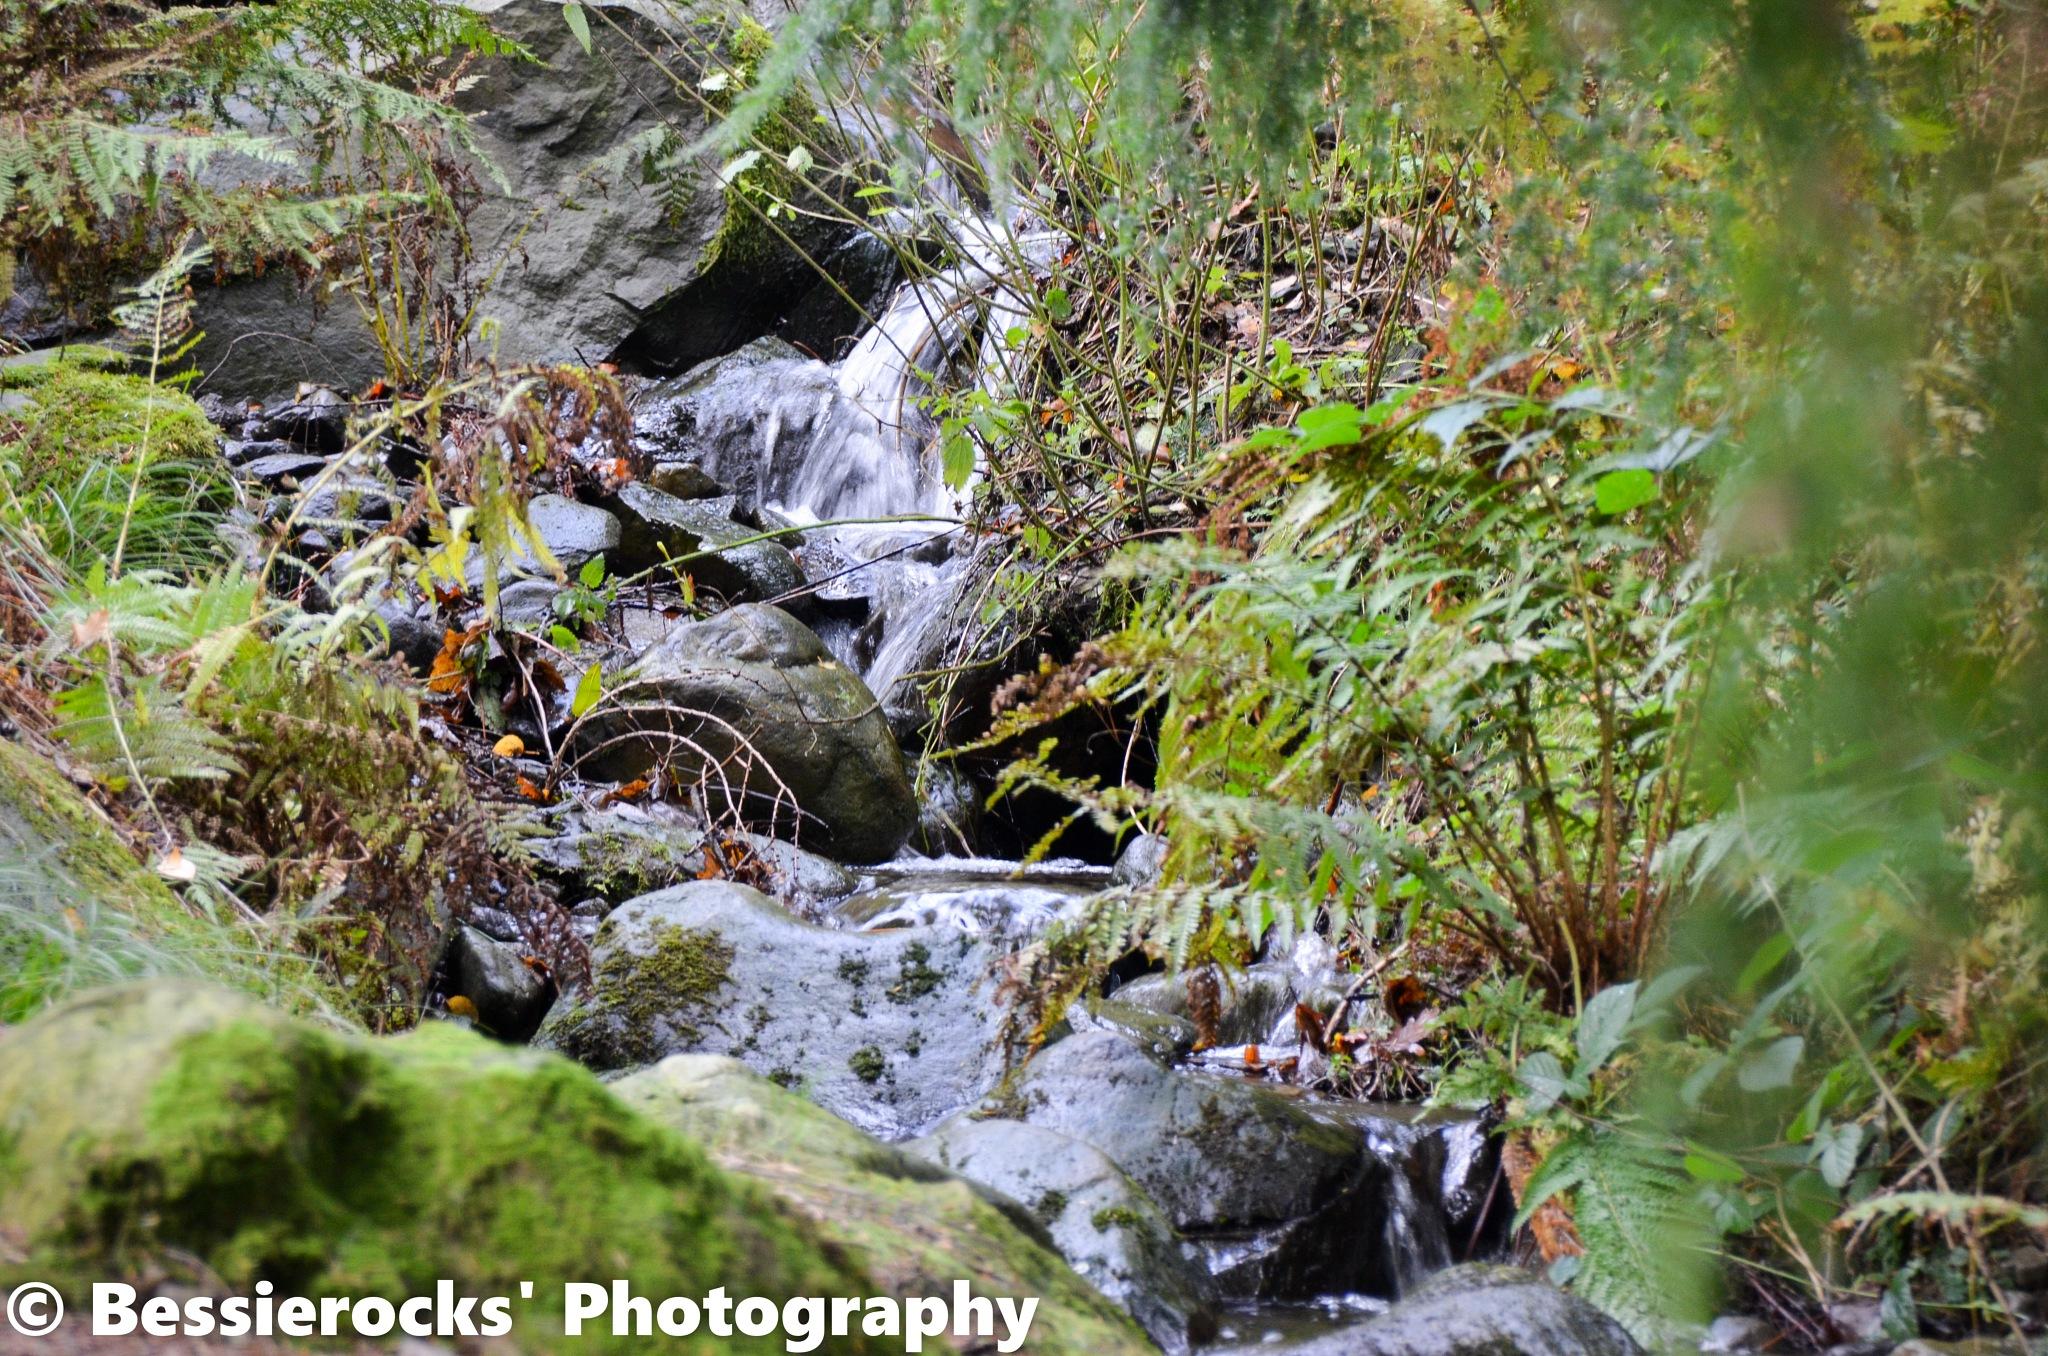 Running water by Bessierocks' Photography